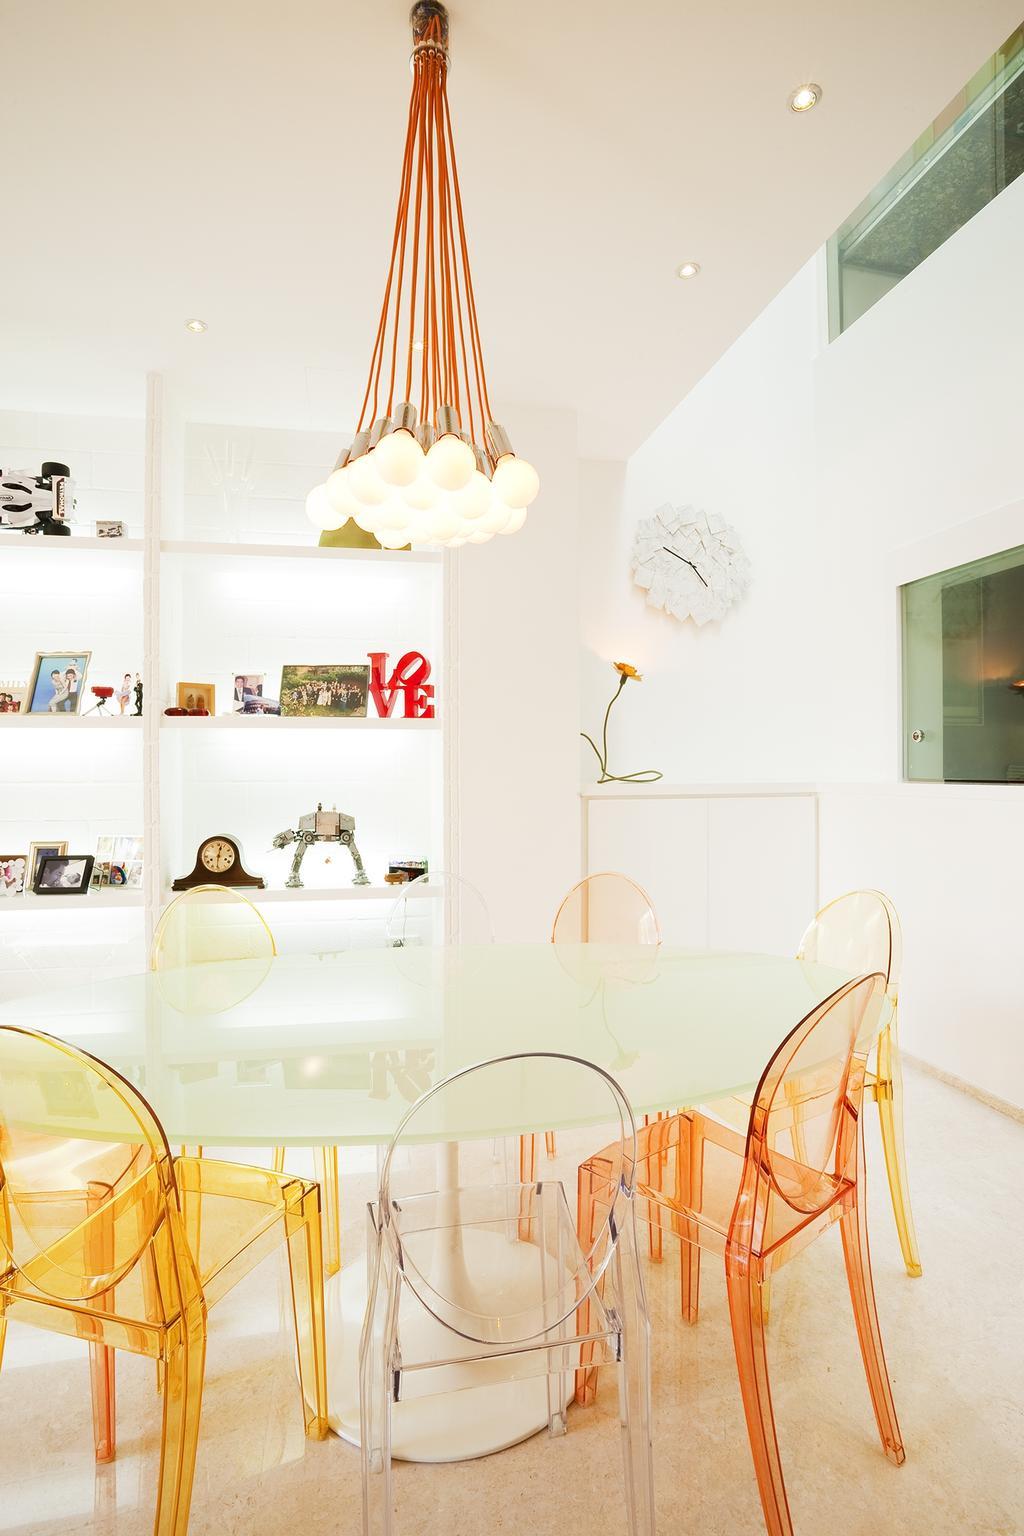 Retro, Landed, Dining Room, Lichi Avenue, Interior Designer, Free Space Intent, Hanging Light, Display Shelf, Dining Table, Door, Sliding Door, Indoors, Interior Design, Room